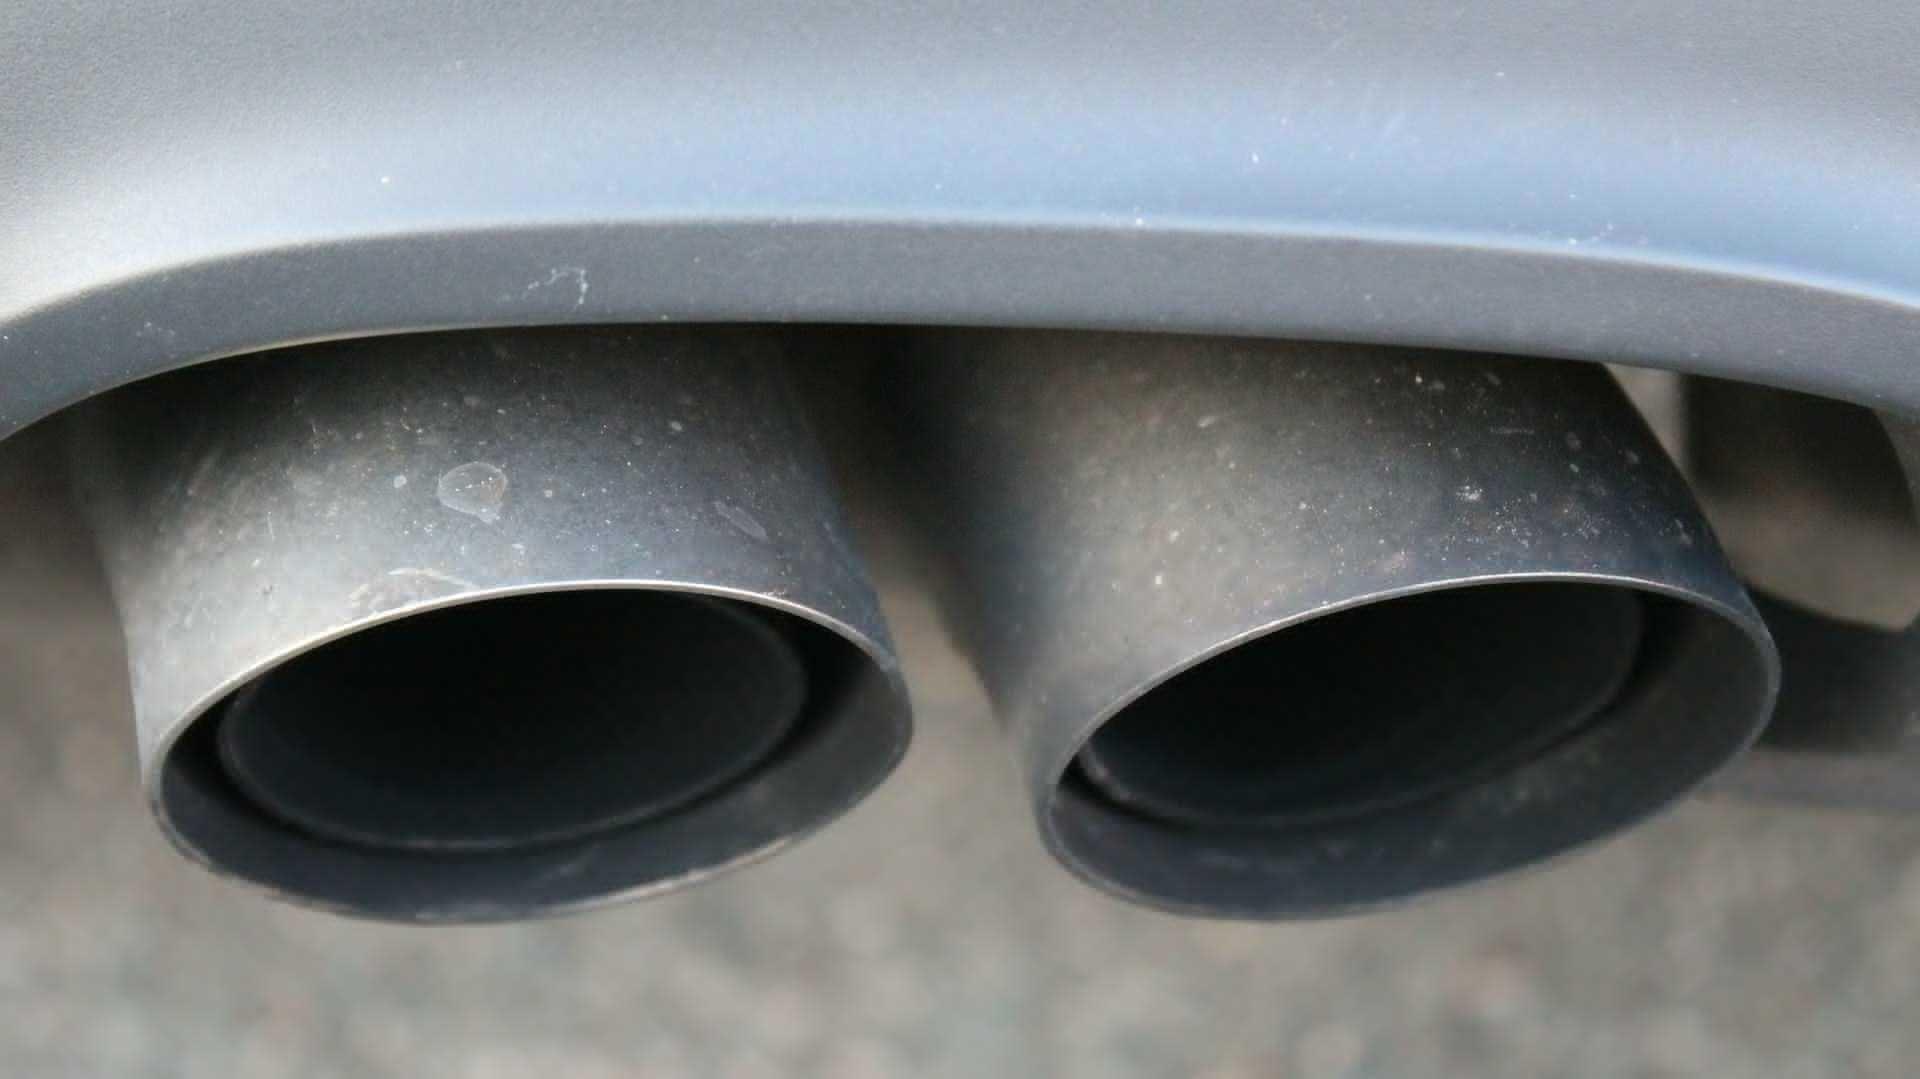 EU-Parlament bringt strengere CO2-Ziele für Autos auf den Weg